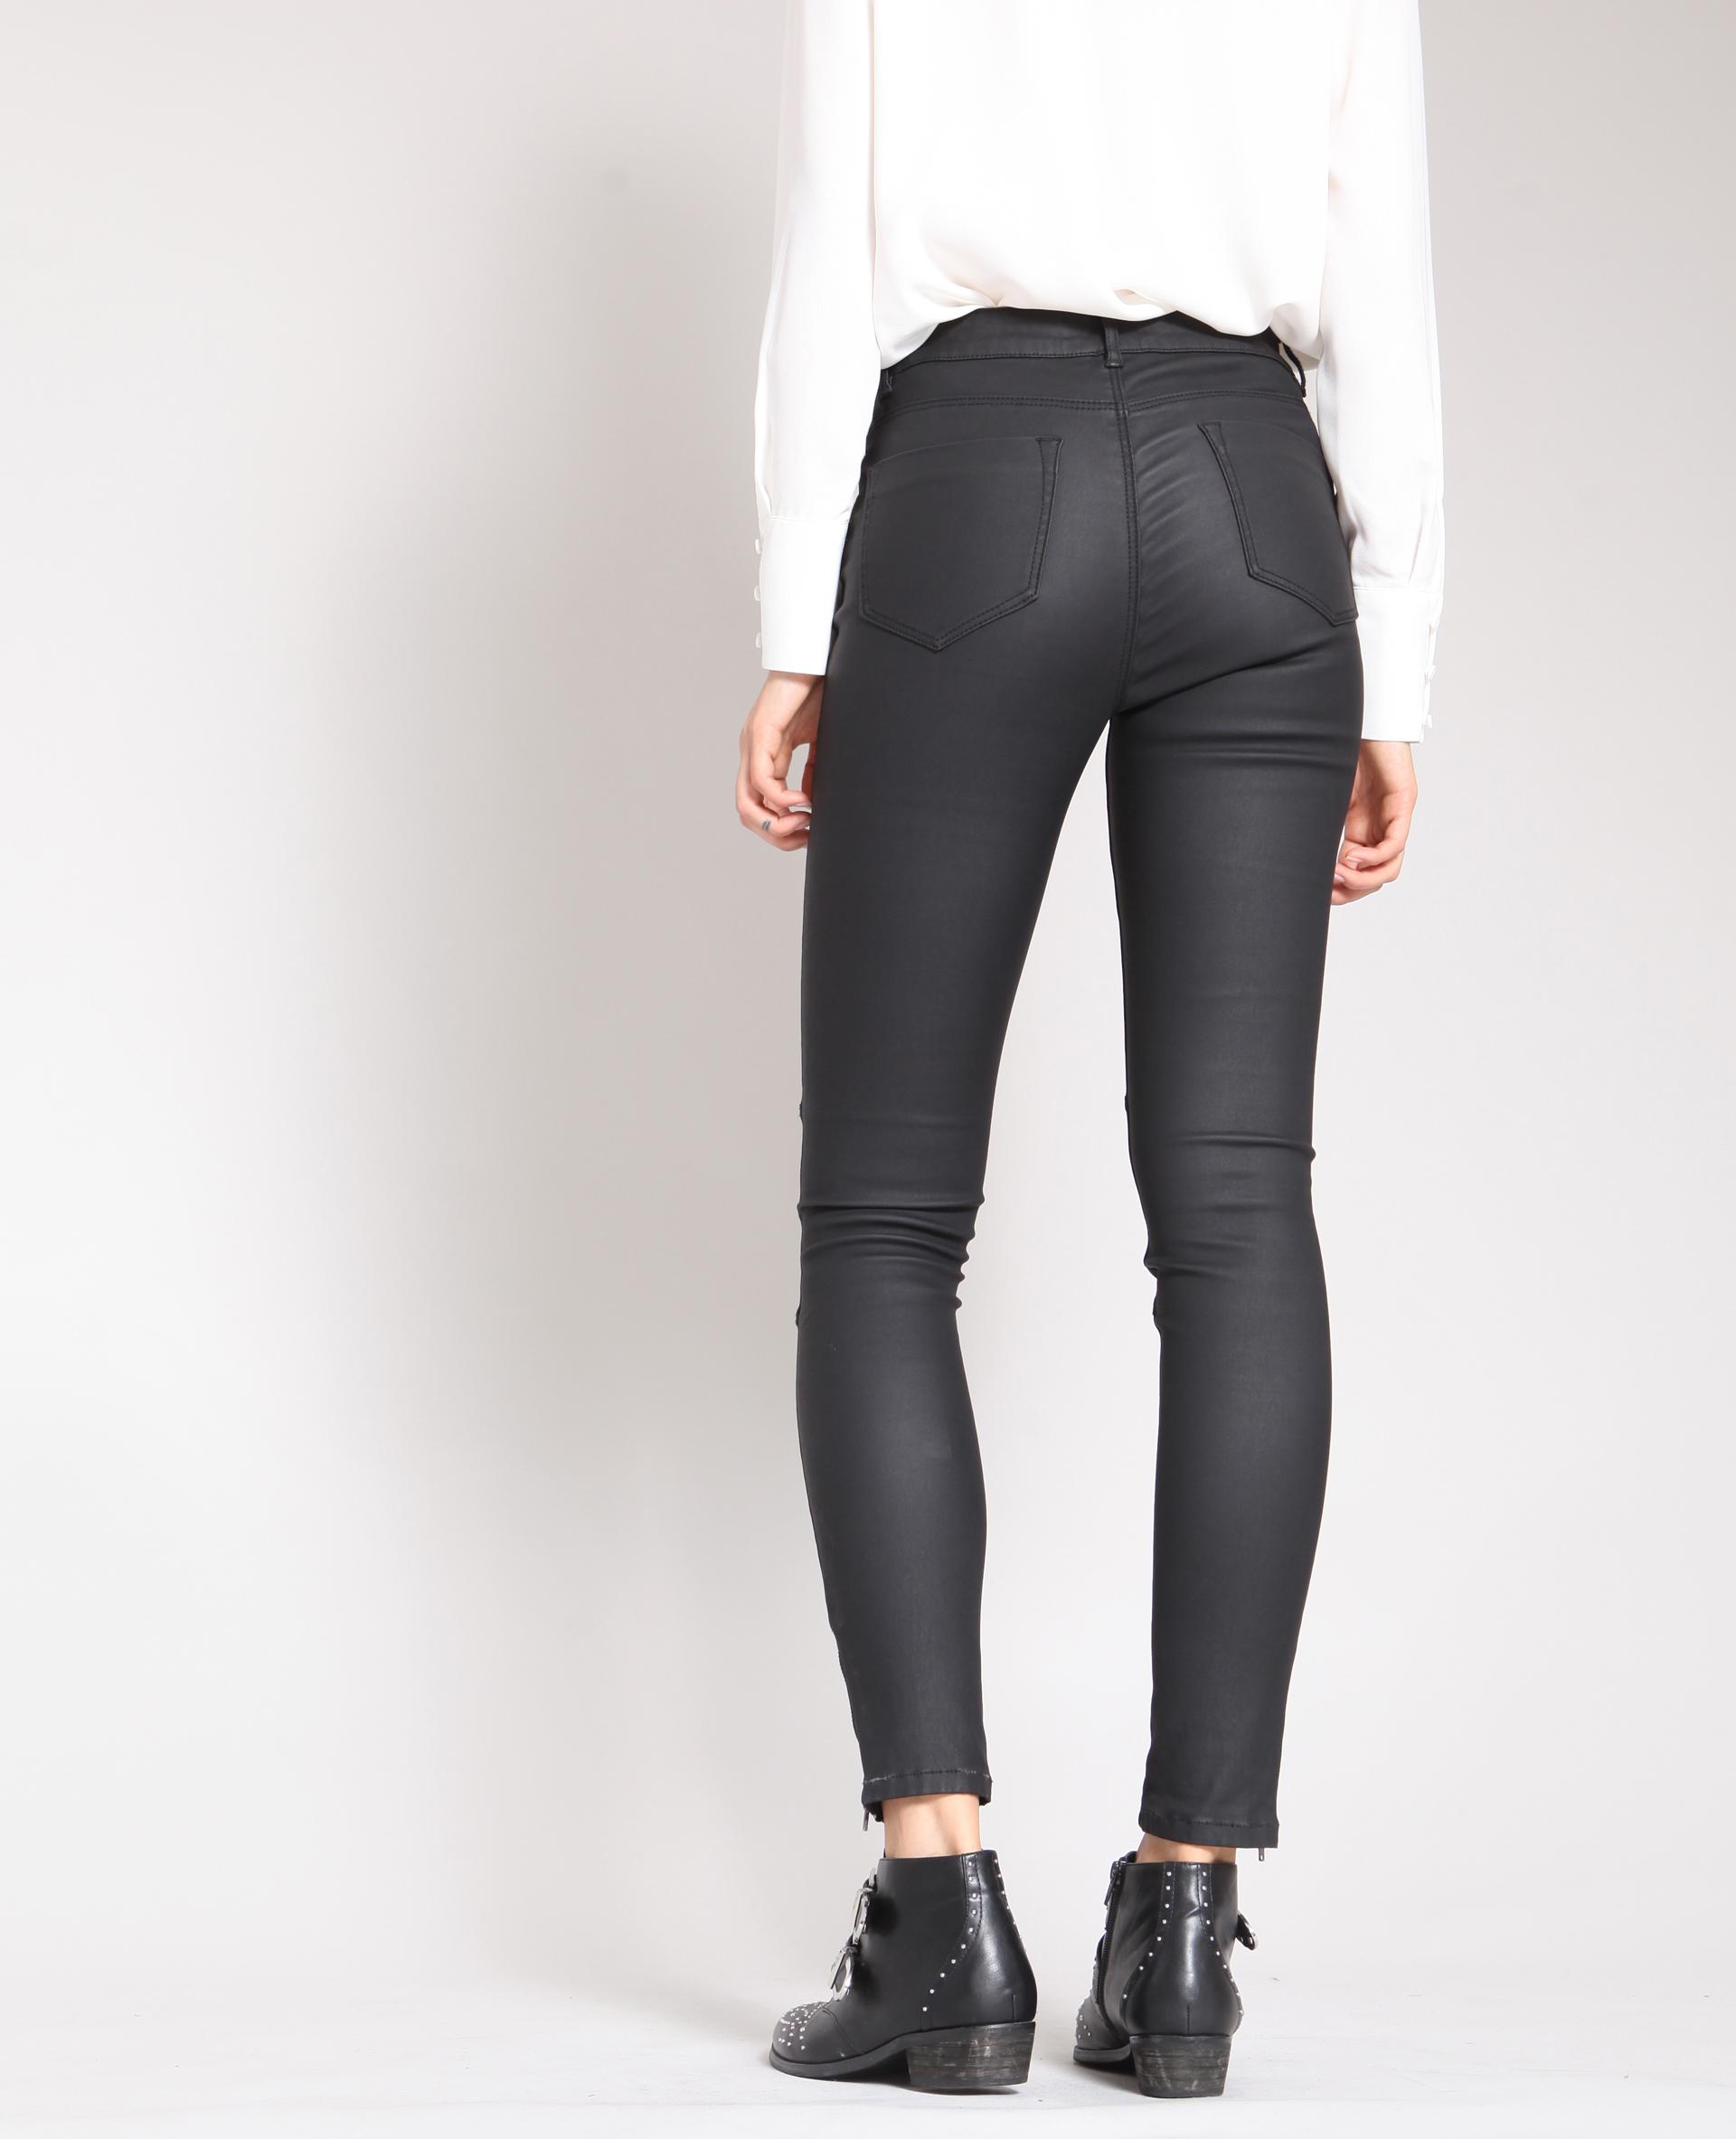 5c7bf77aabb5c Skinny enduit noir -30% - 140666899A08 | Pimkie